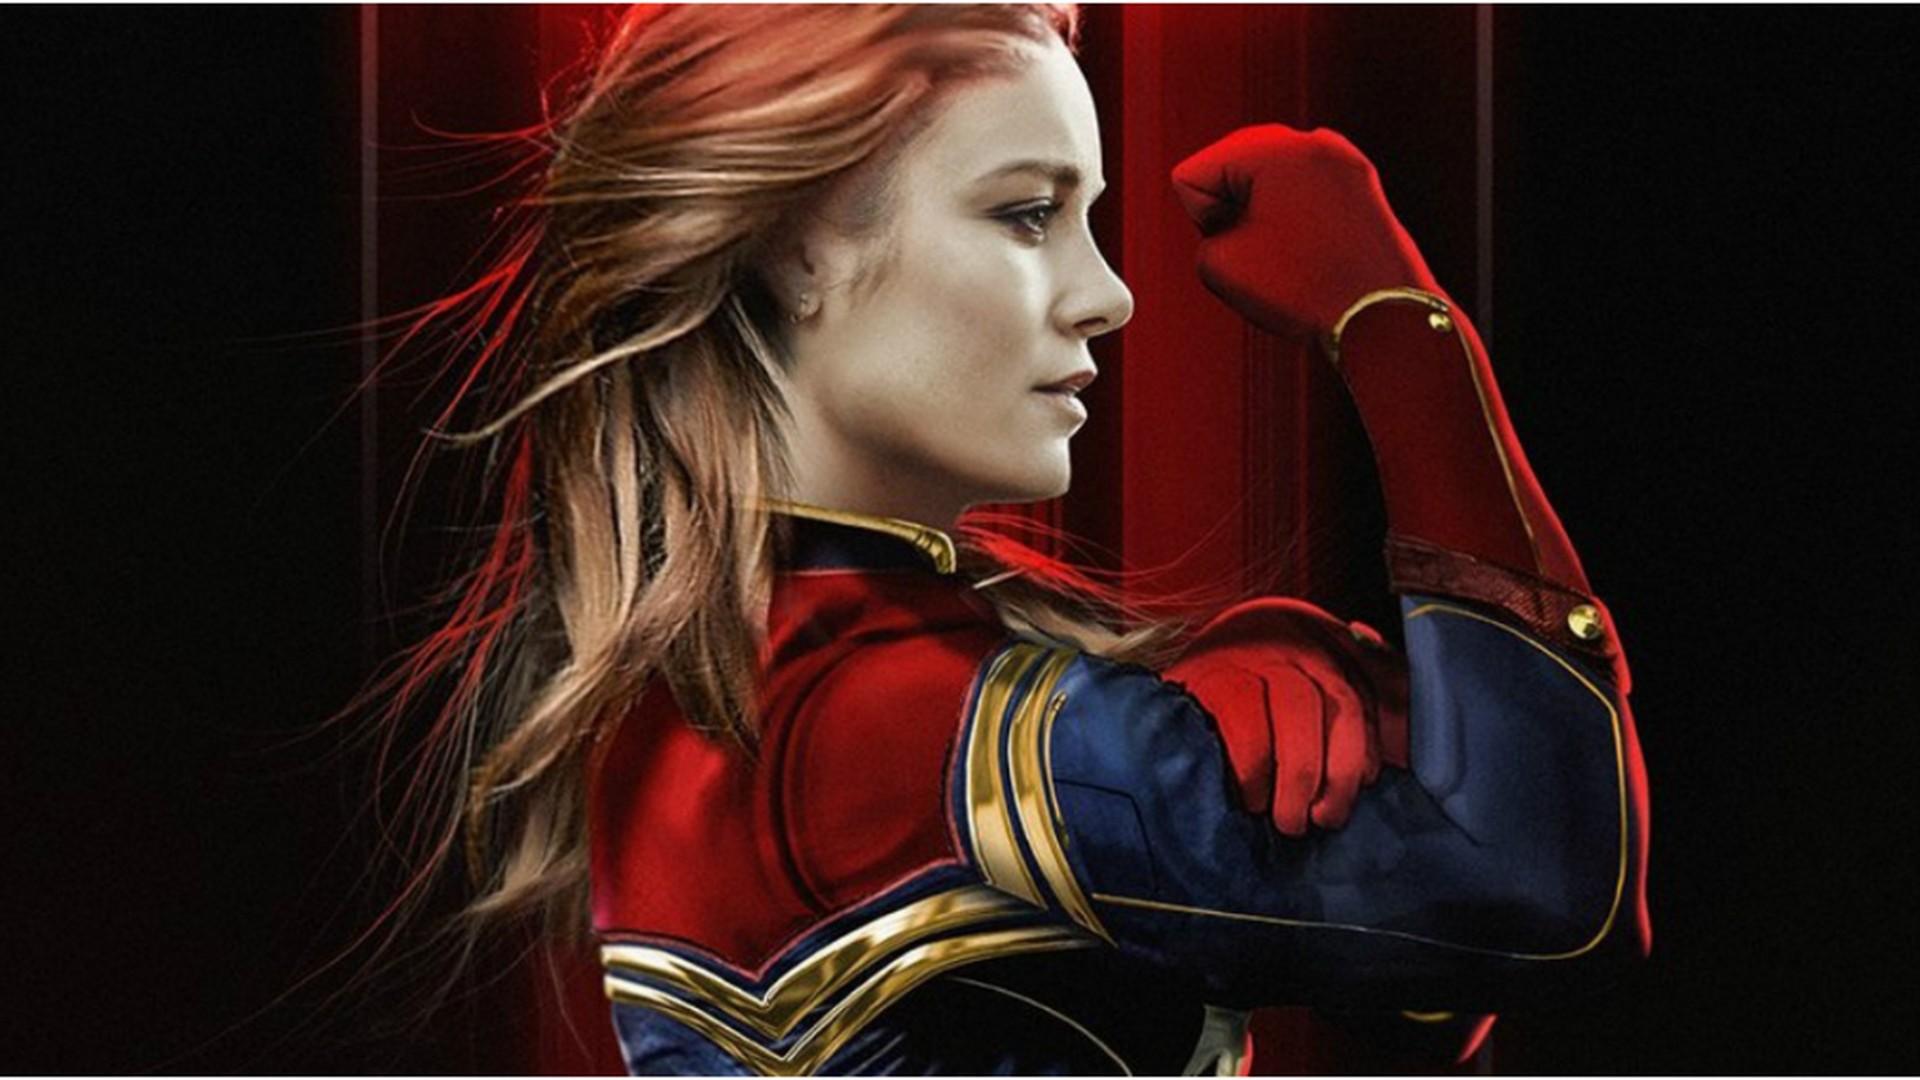 Captain Marvel 2019 Movie Wallpaper With High Resolution 4k Captain Marvel Backgrounds 1920x1080 Download Hd Wallpaper Wallpapertip